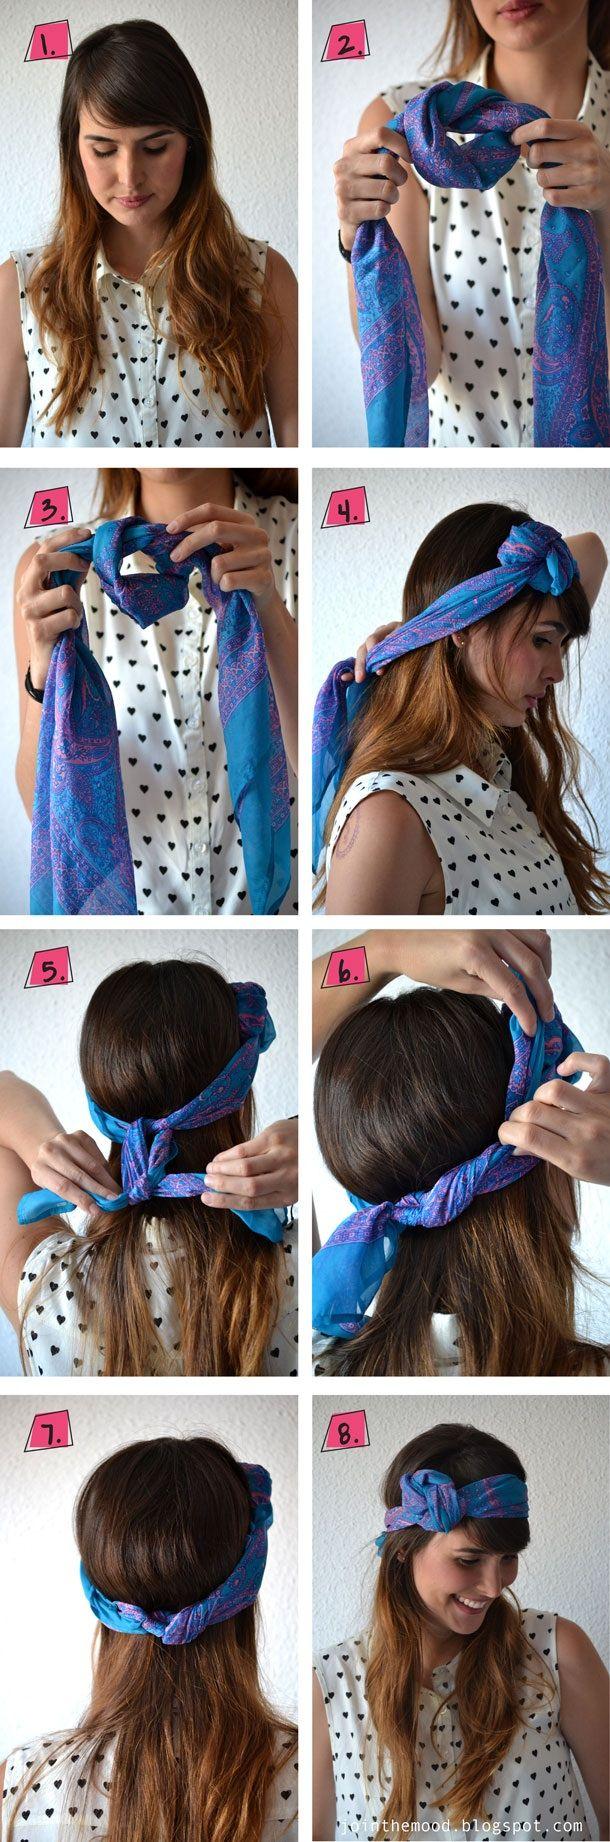 Bandana bandana hairstyle pinterest bandanas scarves and hair